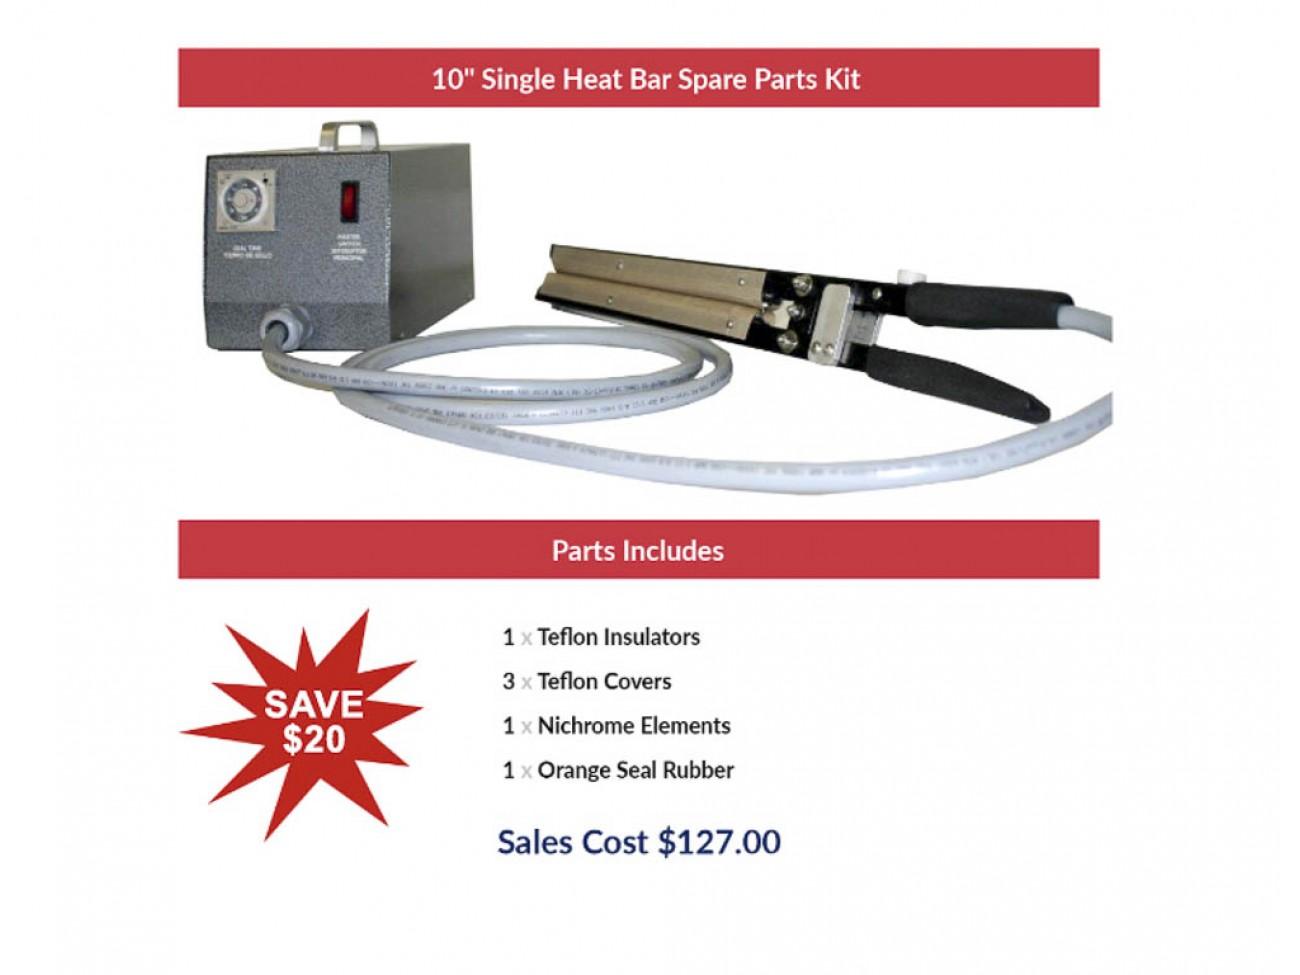 "10"" Single Heat Bar Spare Parts Kit"